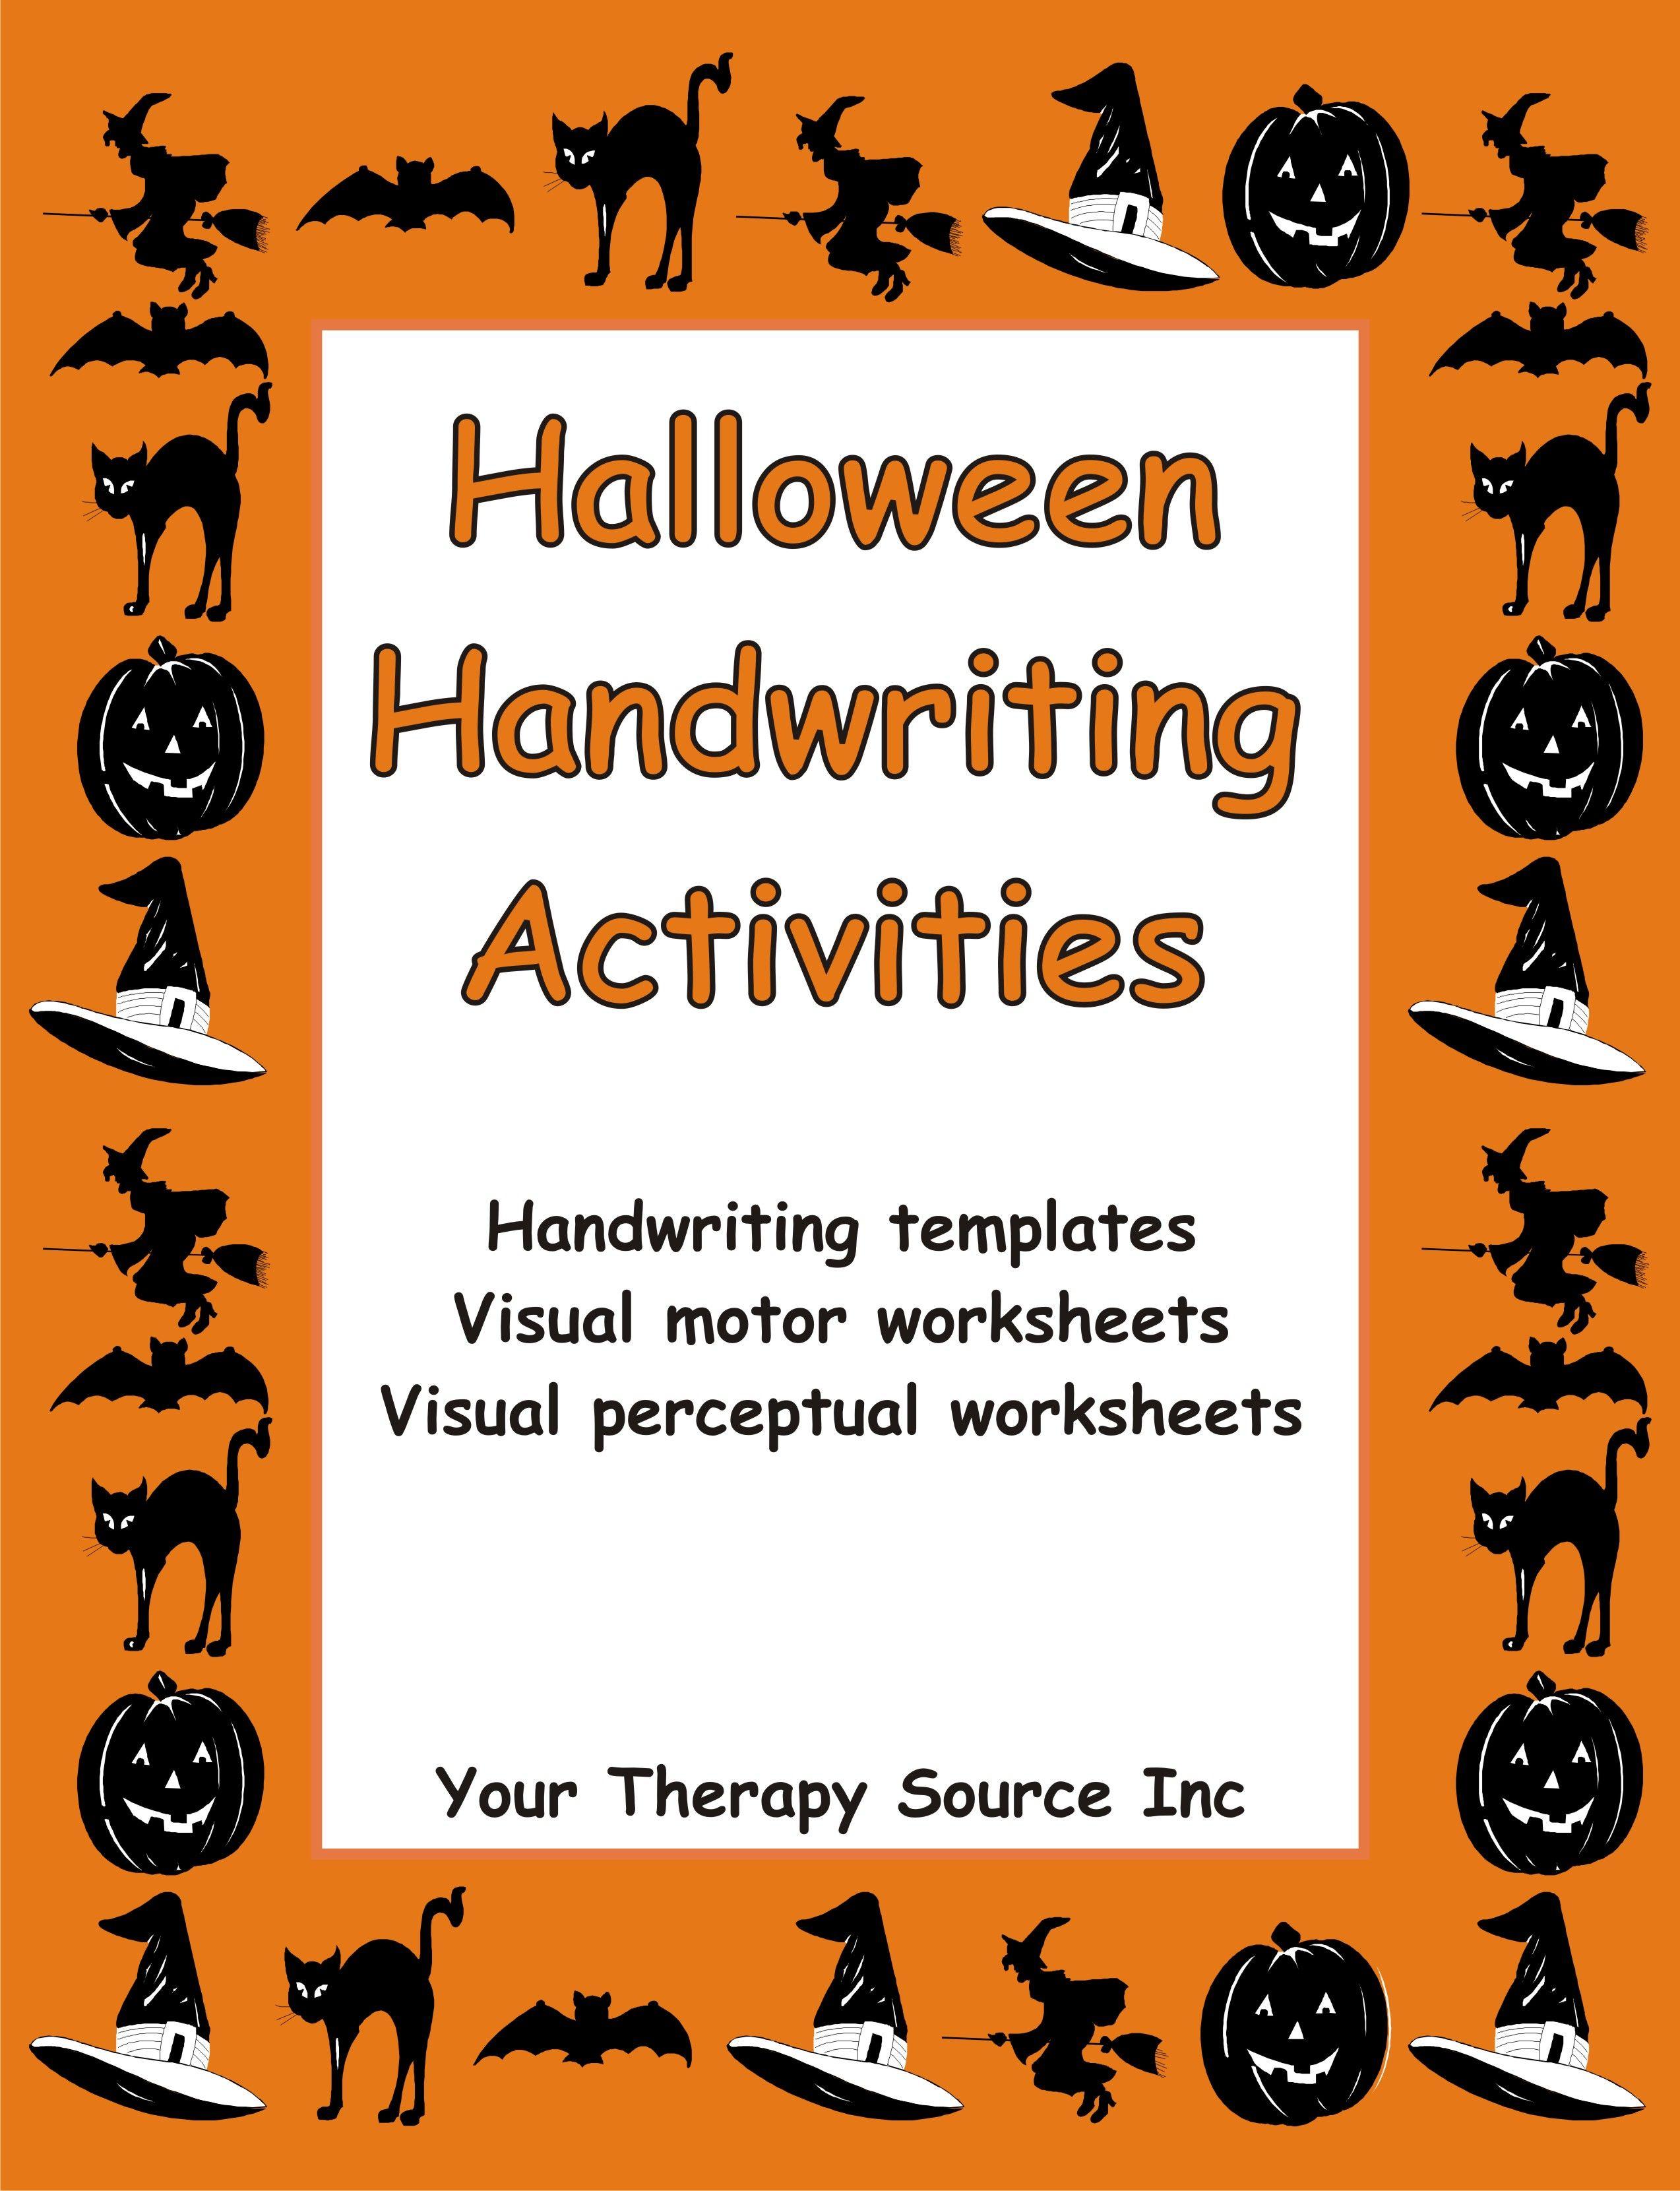 Halloween Handwriting Activities With Images